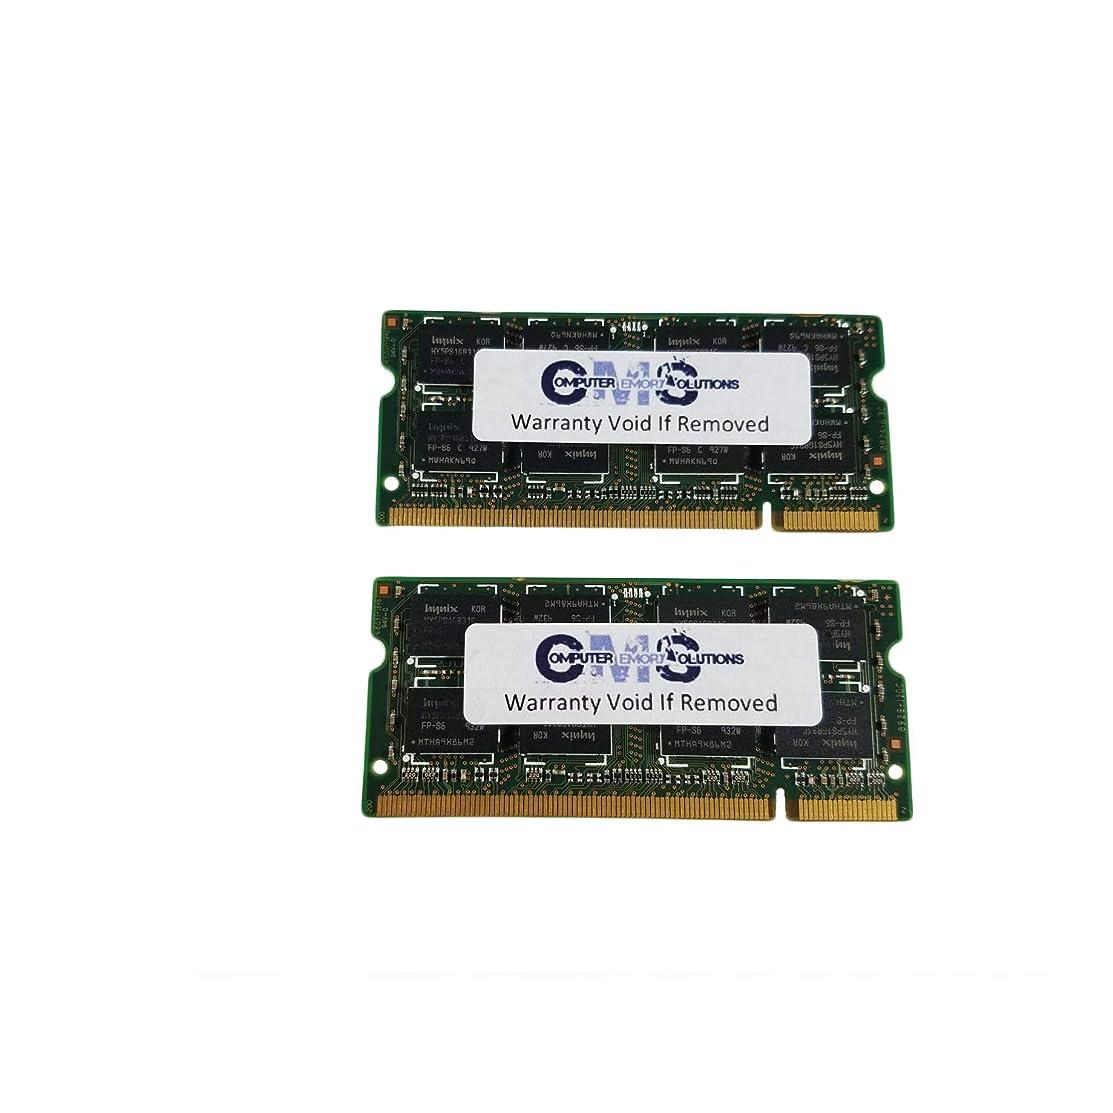 6Gb (1X4Gb+1X2Gb) Sodimm Memory Ram Compatible with Apple Macbook Core 2 Duo 2.1 13